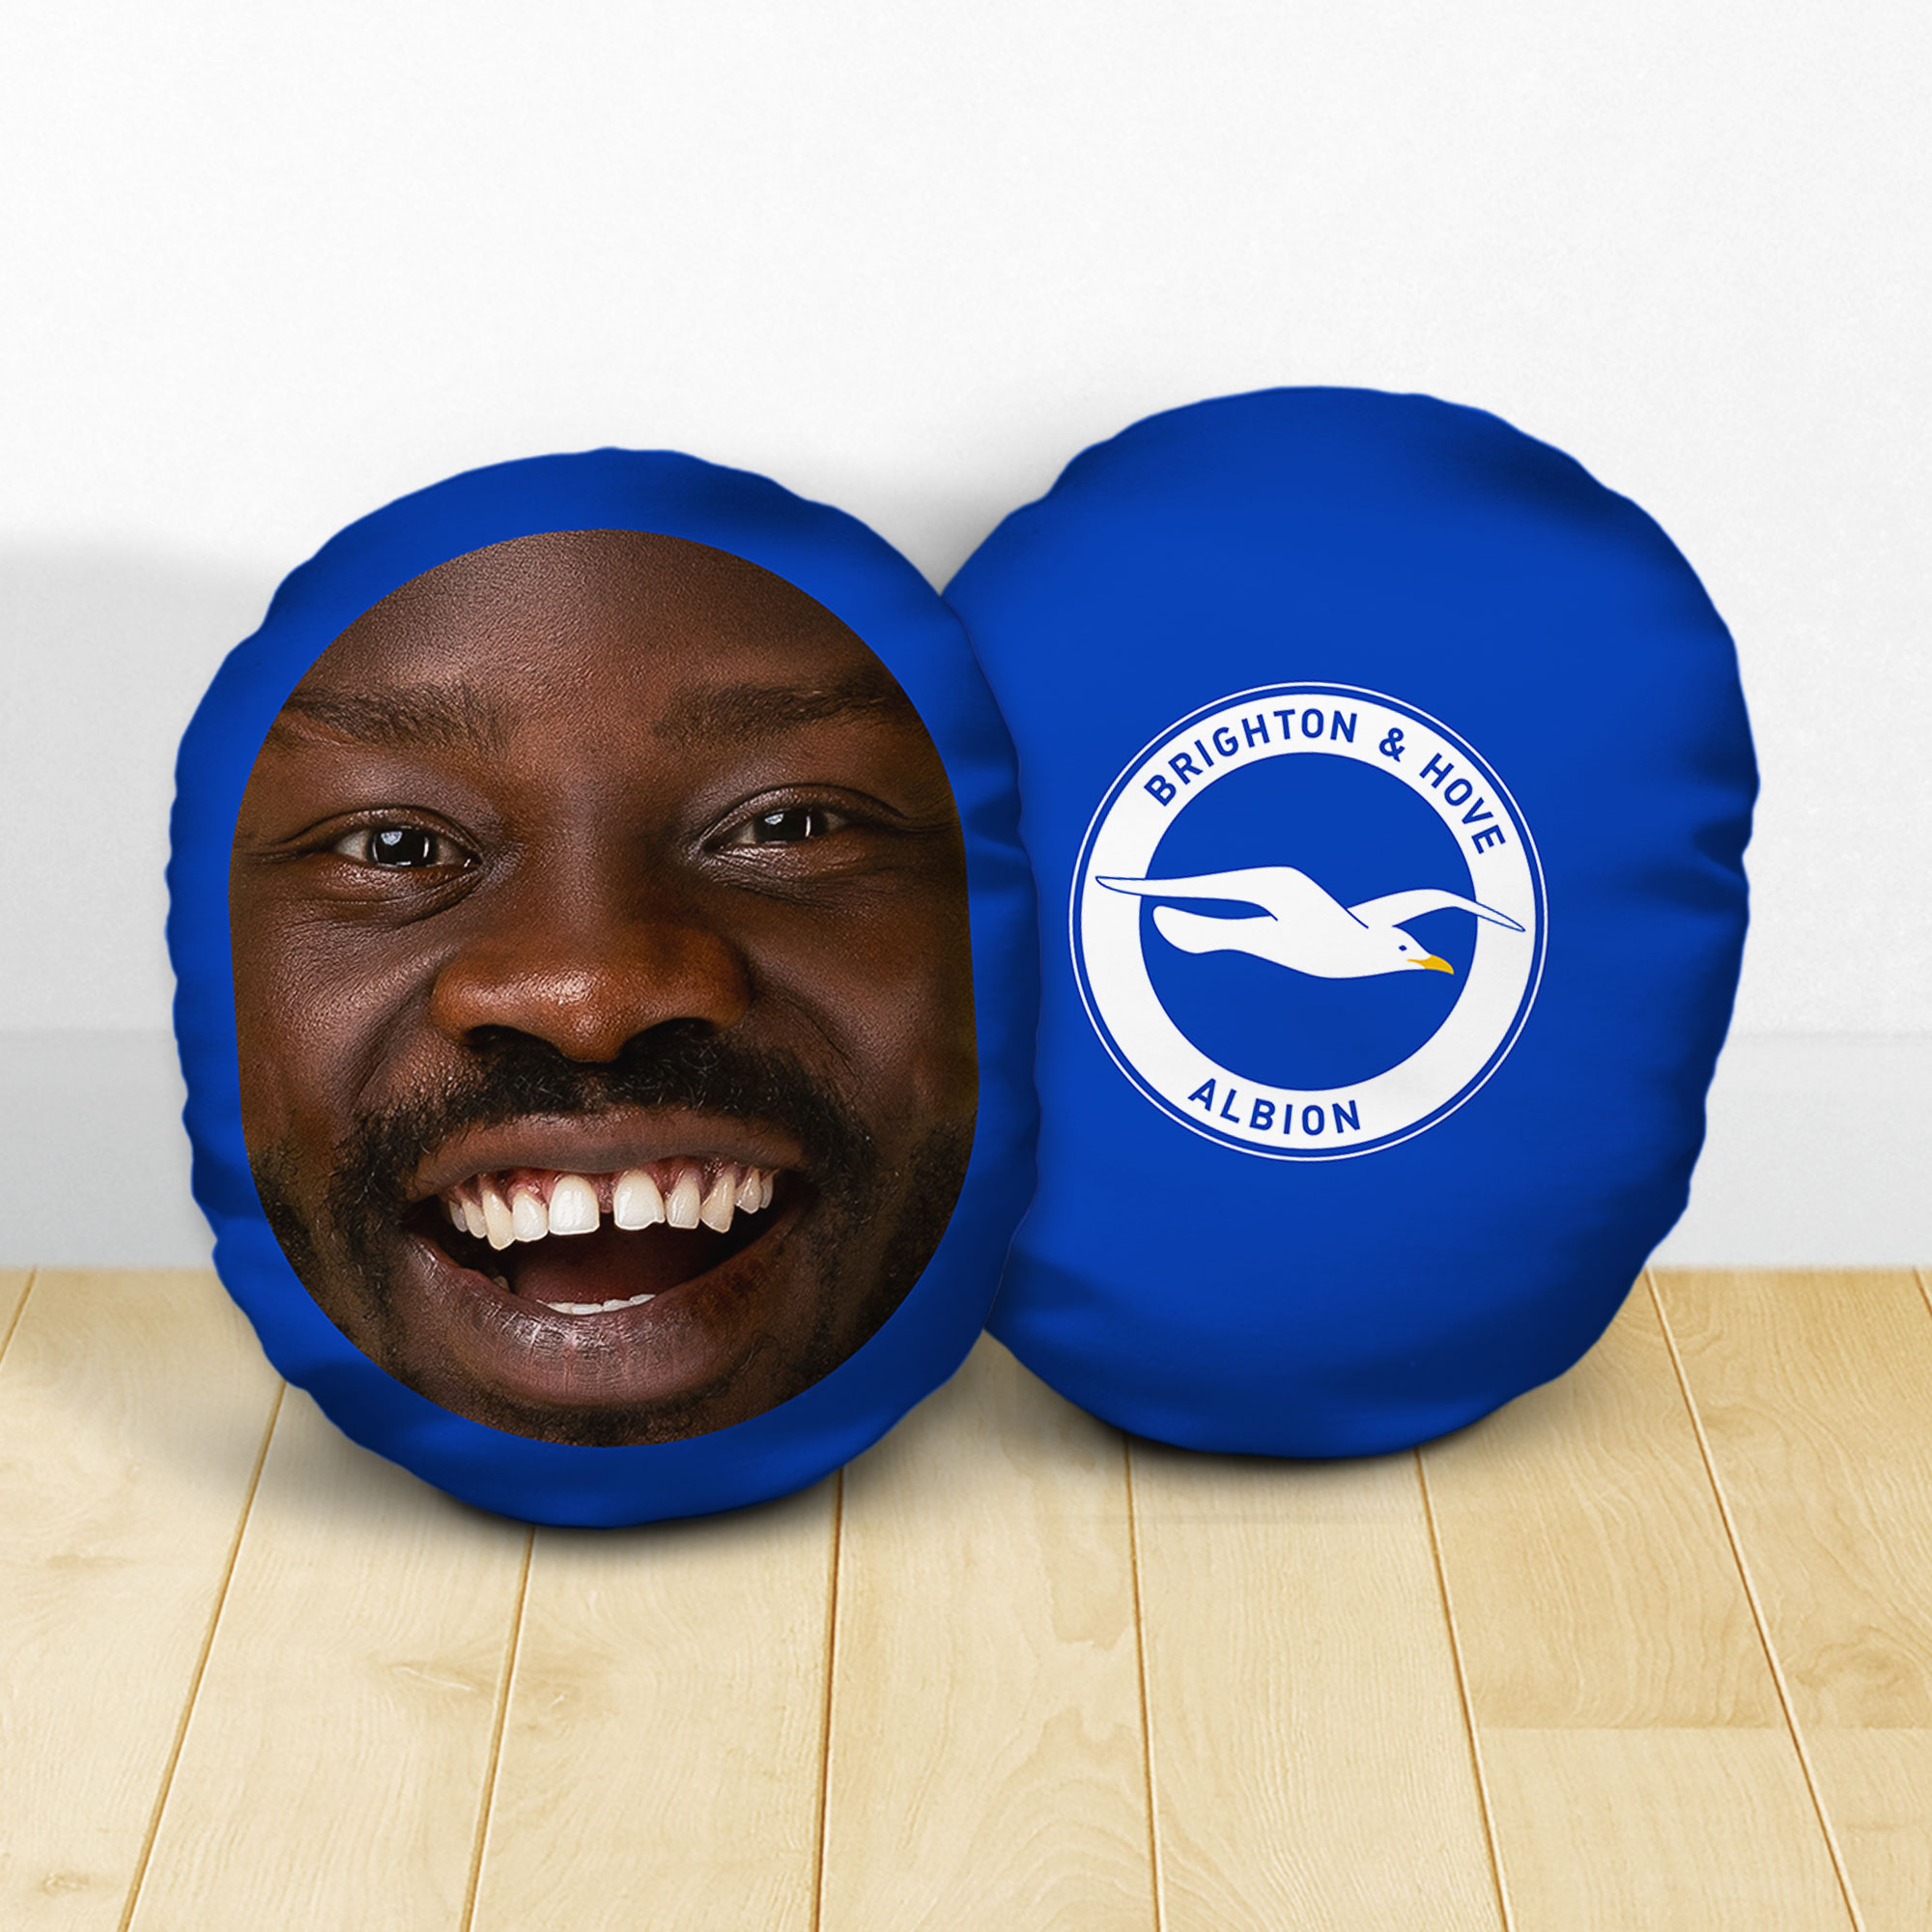 Personalised Brighton & Hove Albion FC Crest Mush Cush